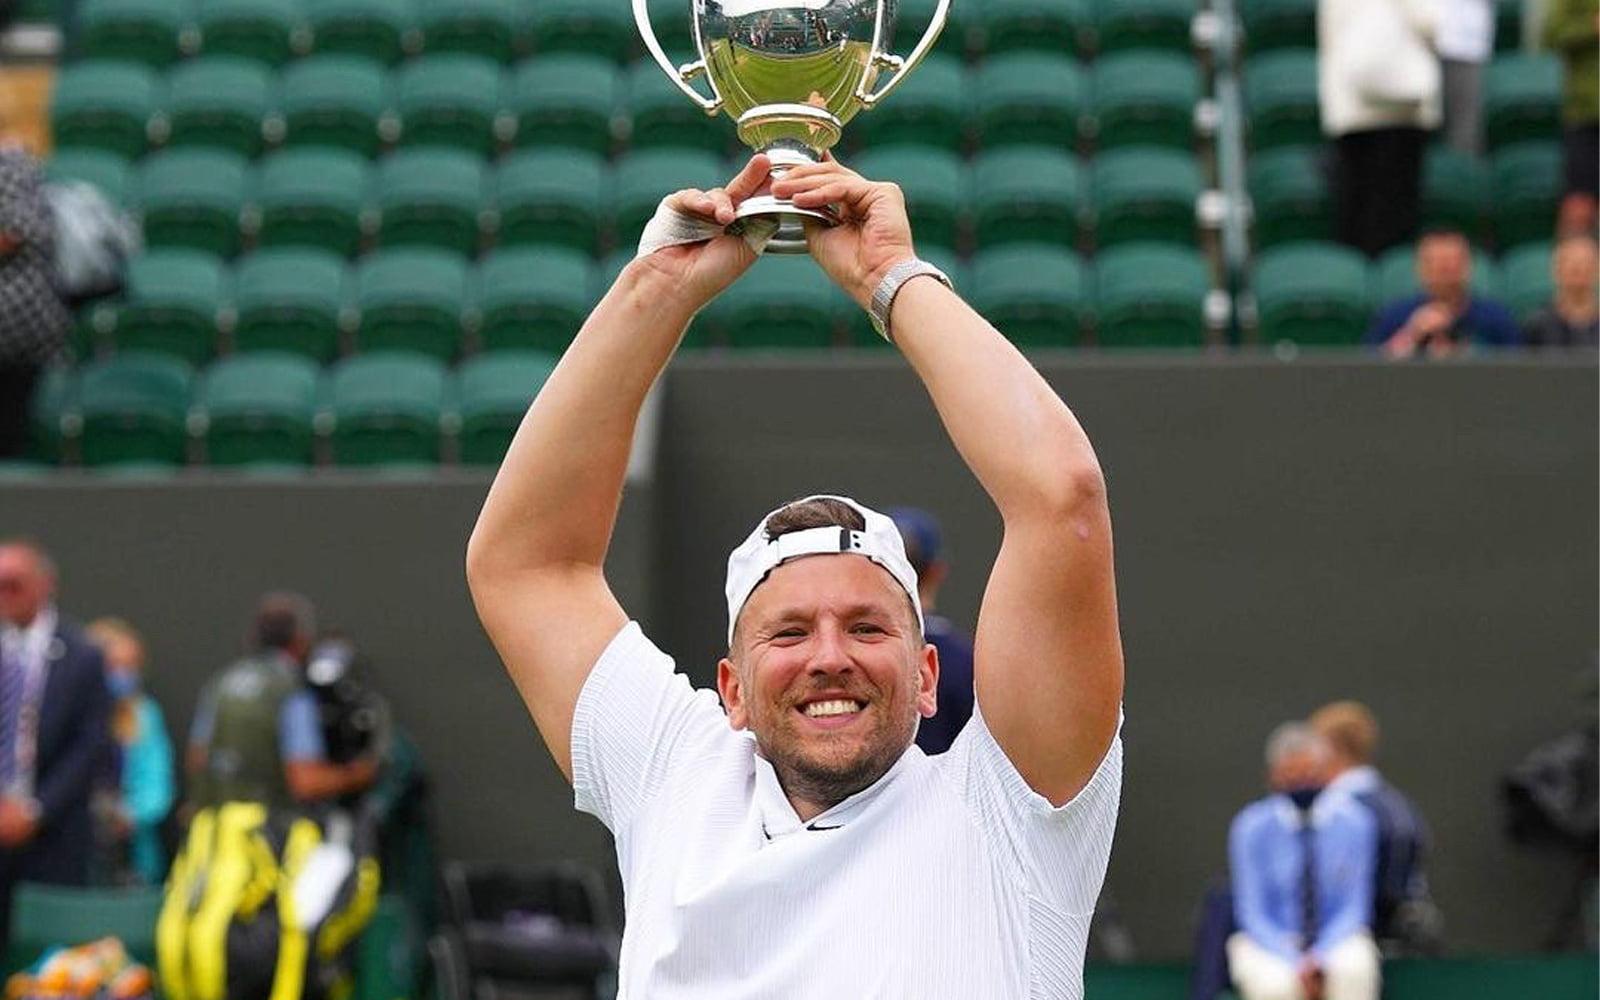 Alcott Crowned Wimbledon Champion